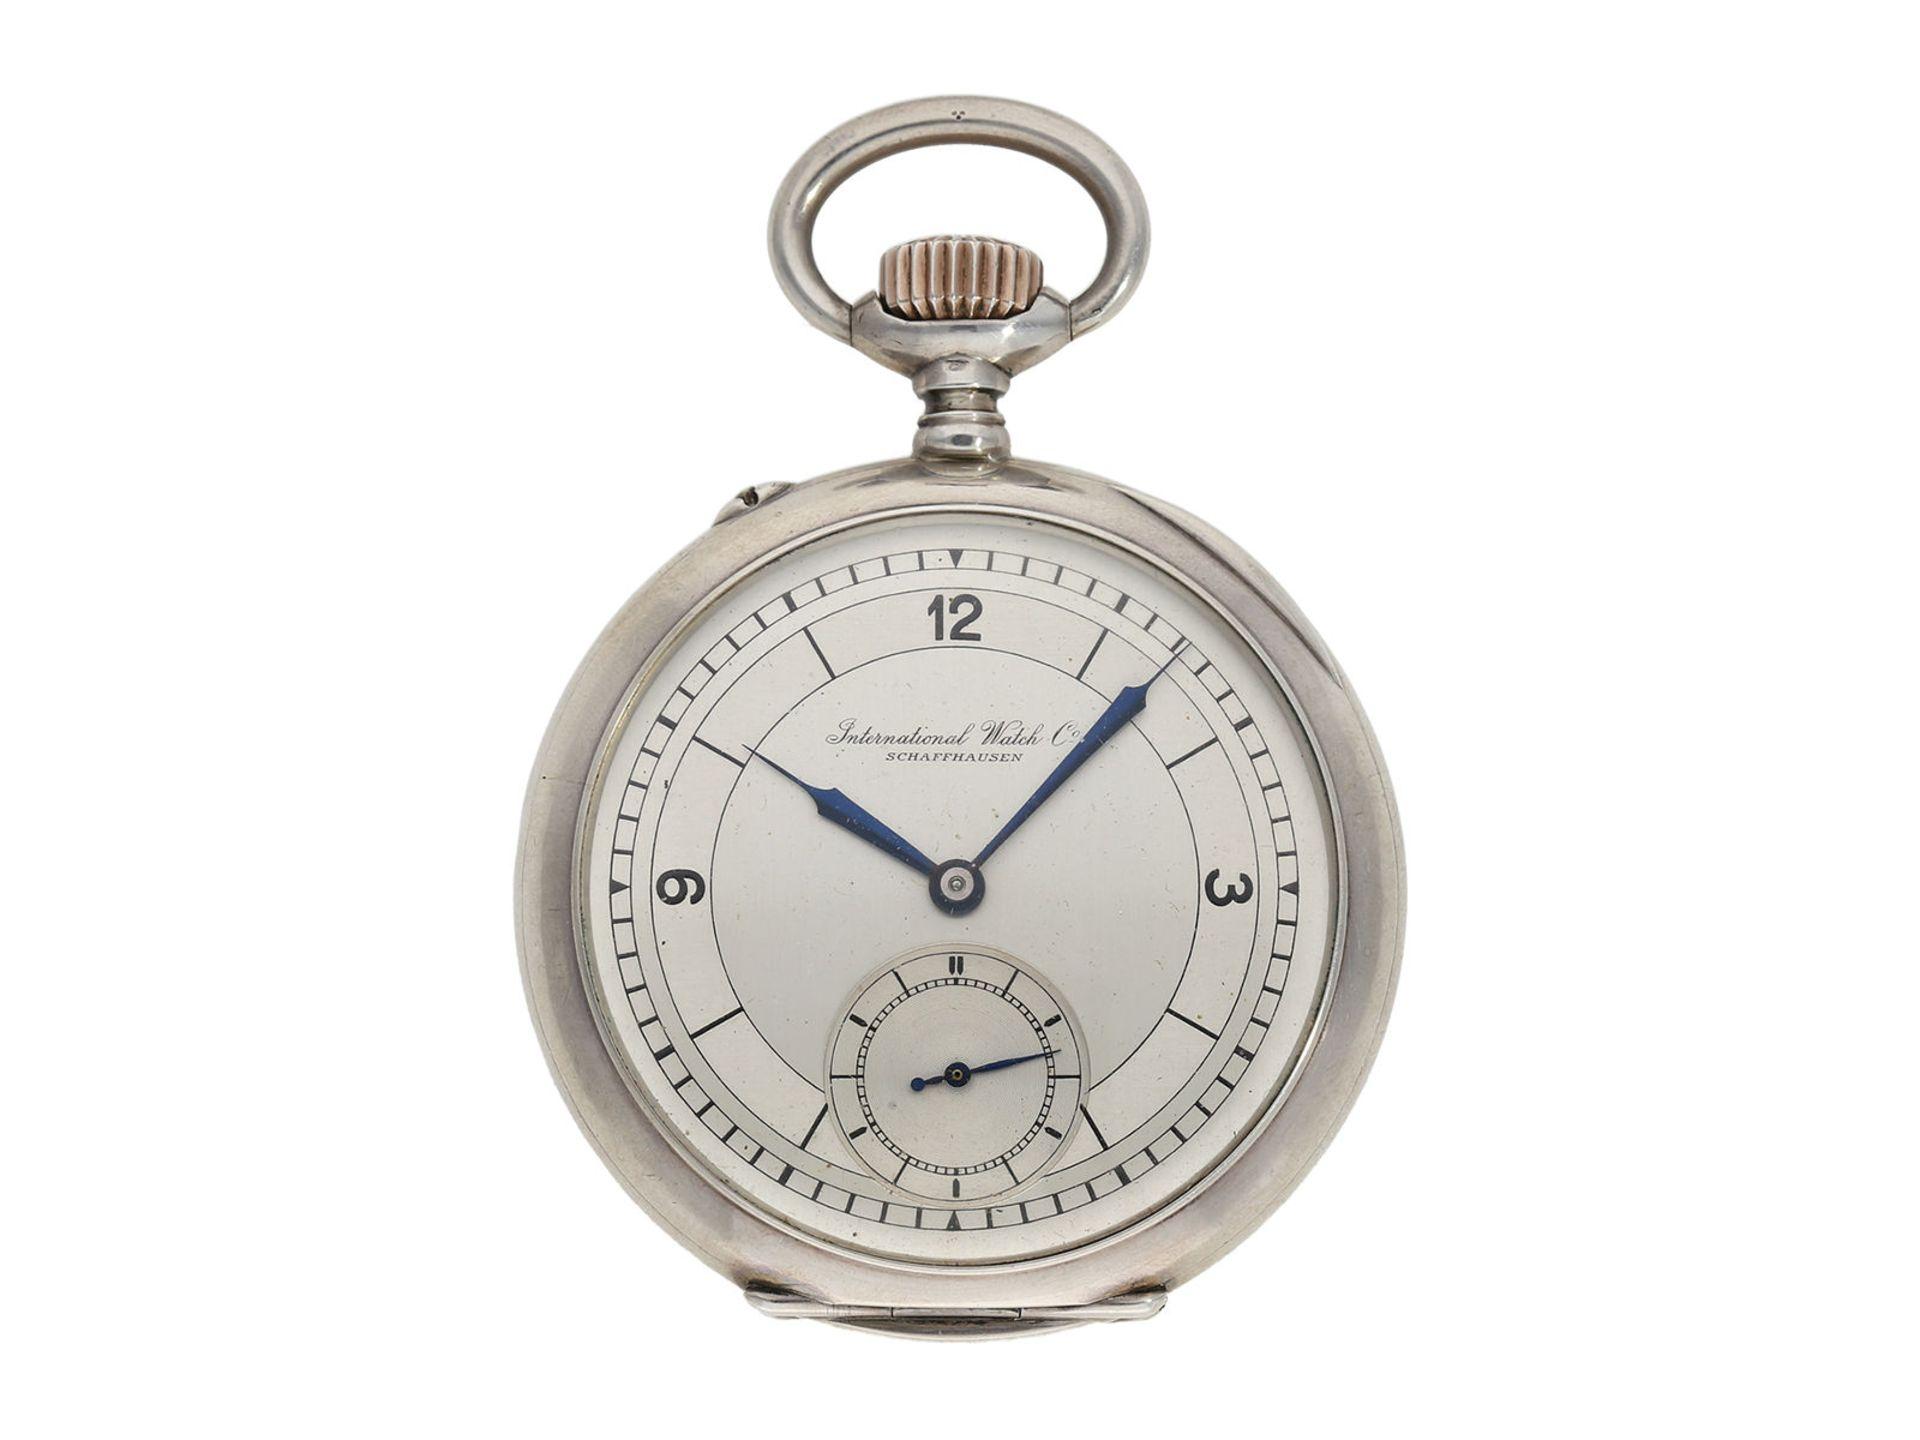 Pocket watch: IWC man's pocket watch with very rare 2-coloured dial, No.309843, Schaffhausen ca.